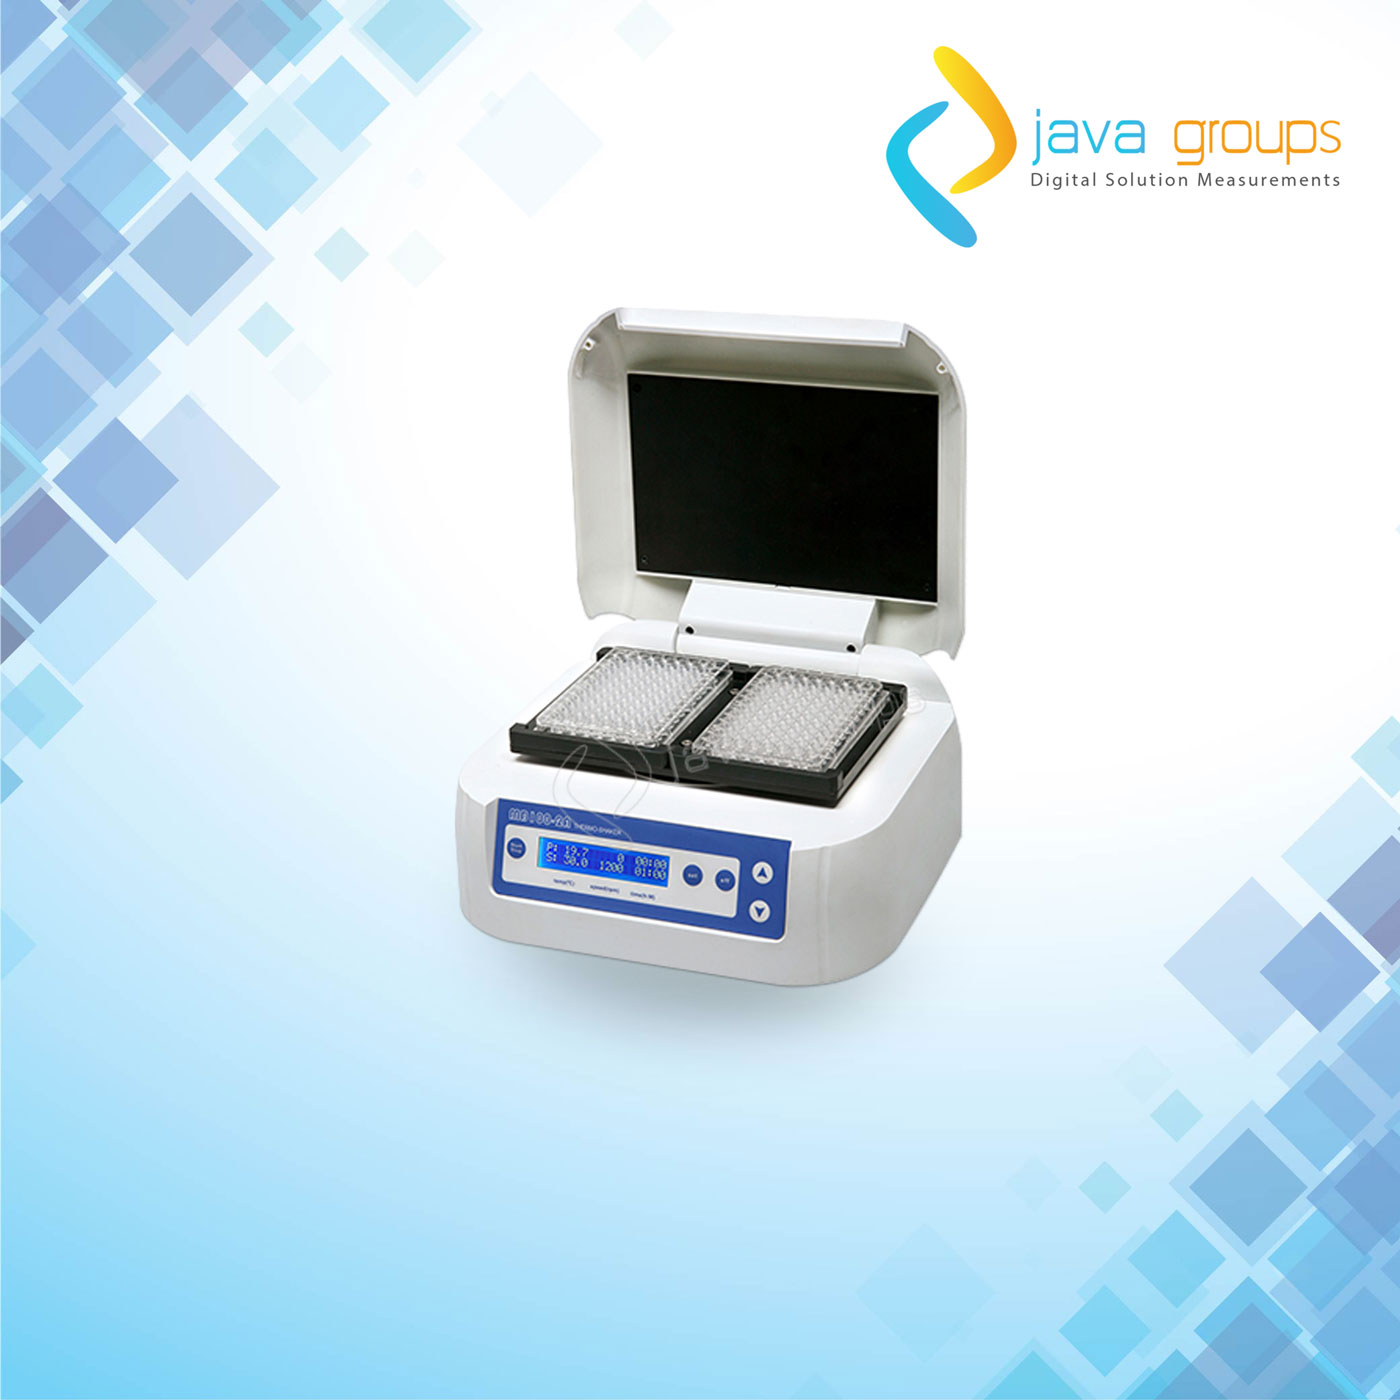 Alat Inkubator Thermo Shaker Seri MB100-2A / MK100-2A